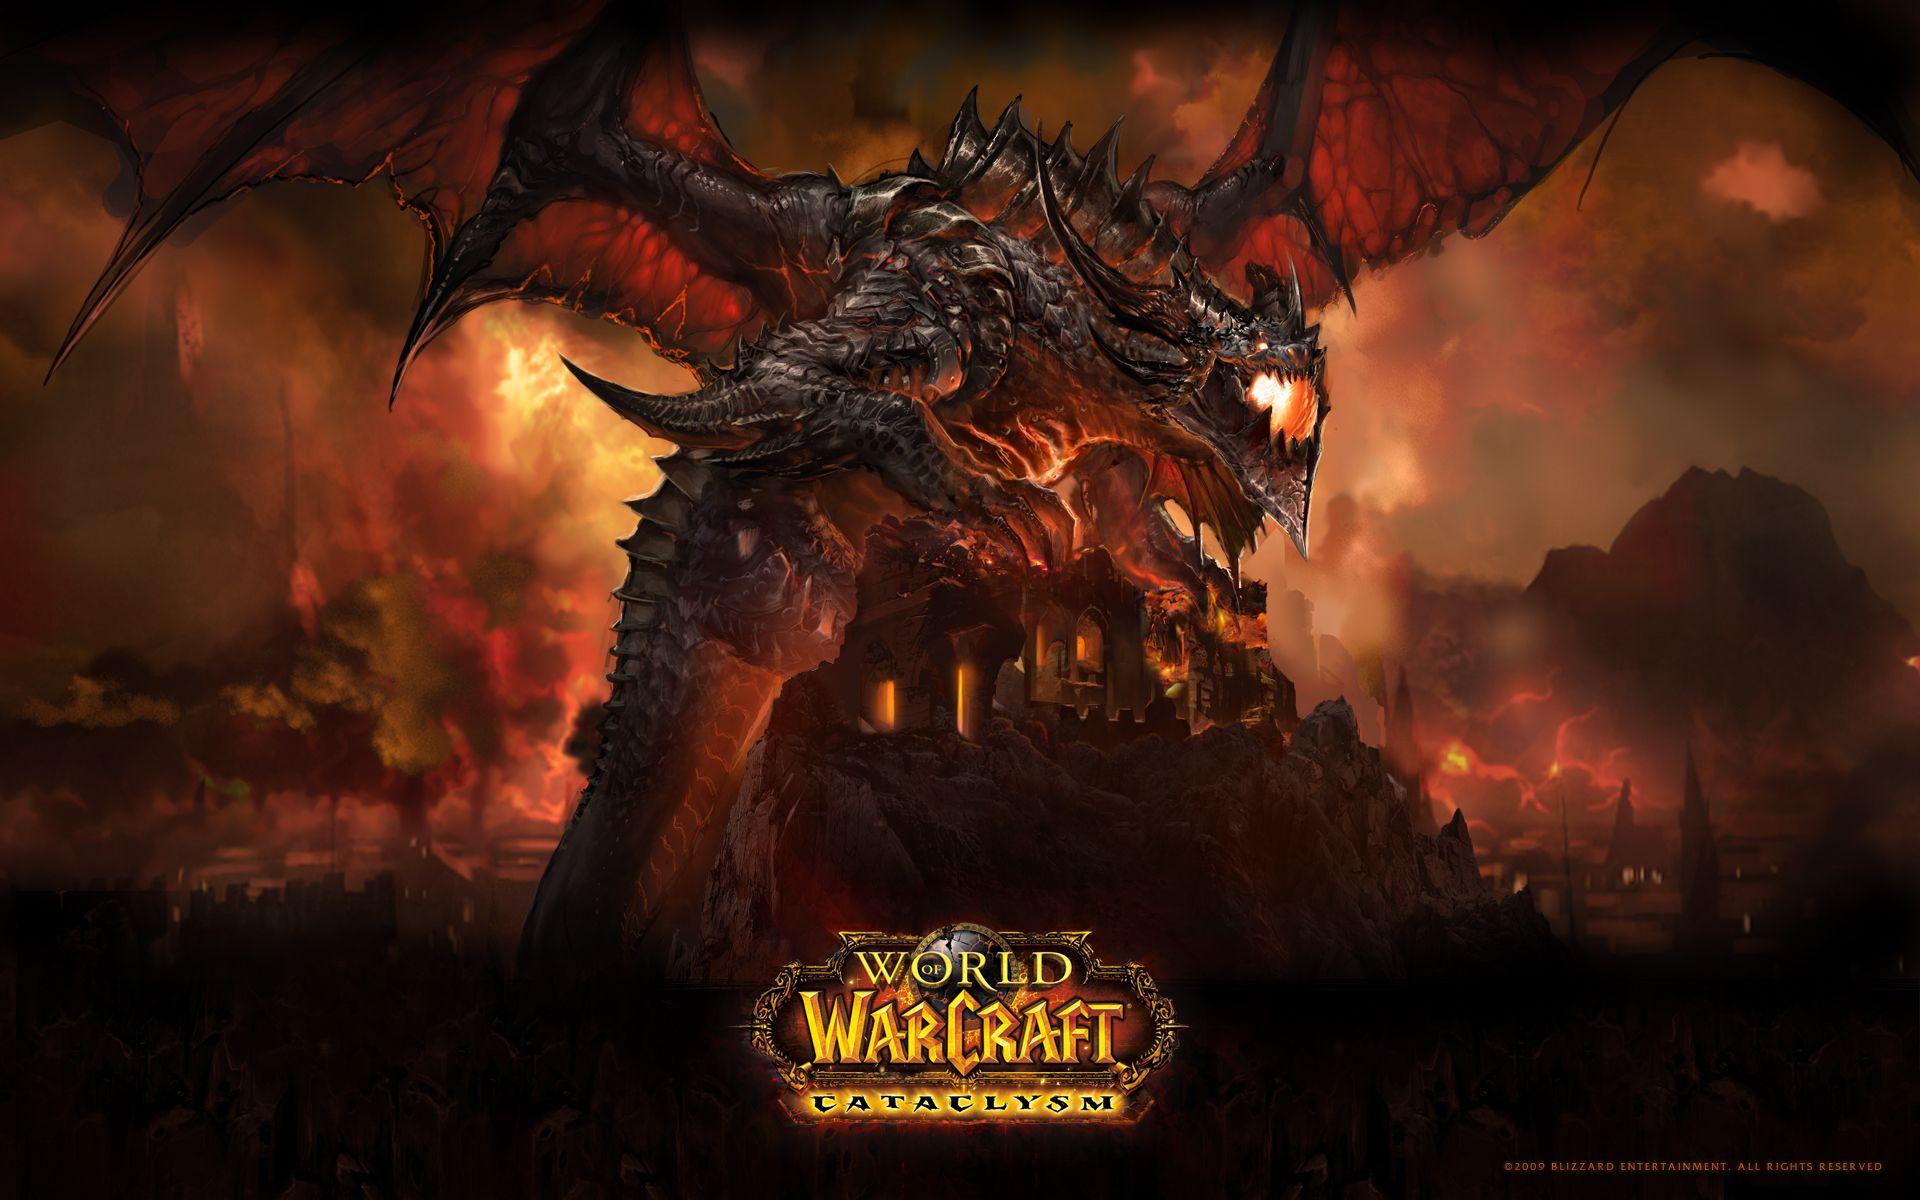 World of Warcraft Cataclysm 1080p Wallpaper World of Warcraft 1920x1200